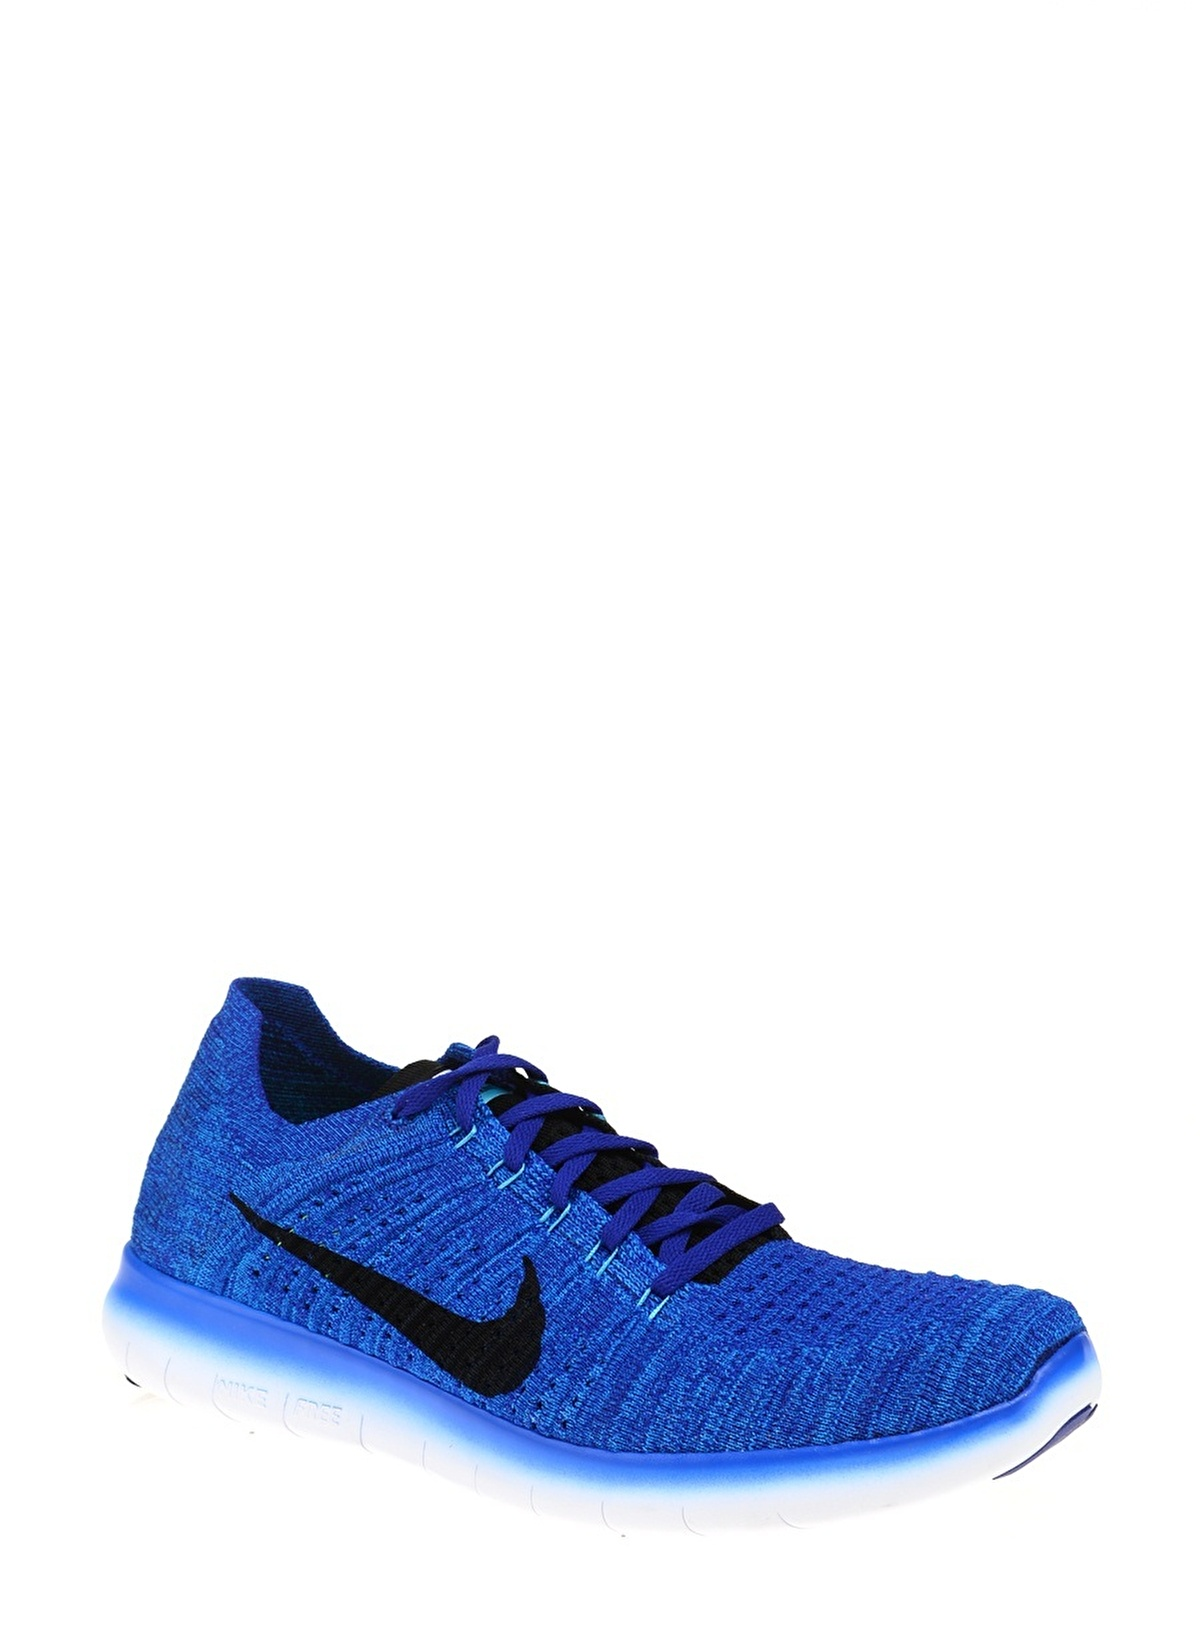 b7a91e19c5eb Nike Erkek Nike Free Rn Flyknit Concord Black-Pht Blue-Gmm Bl ...